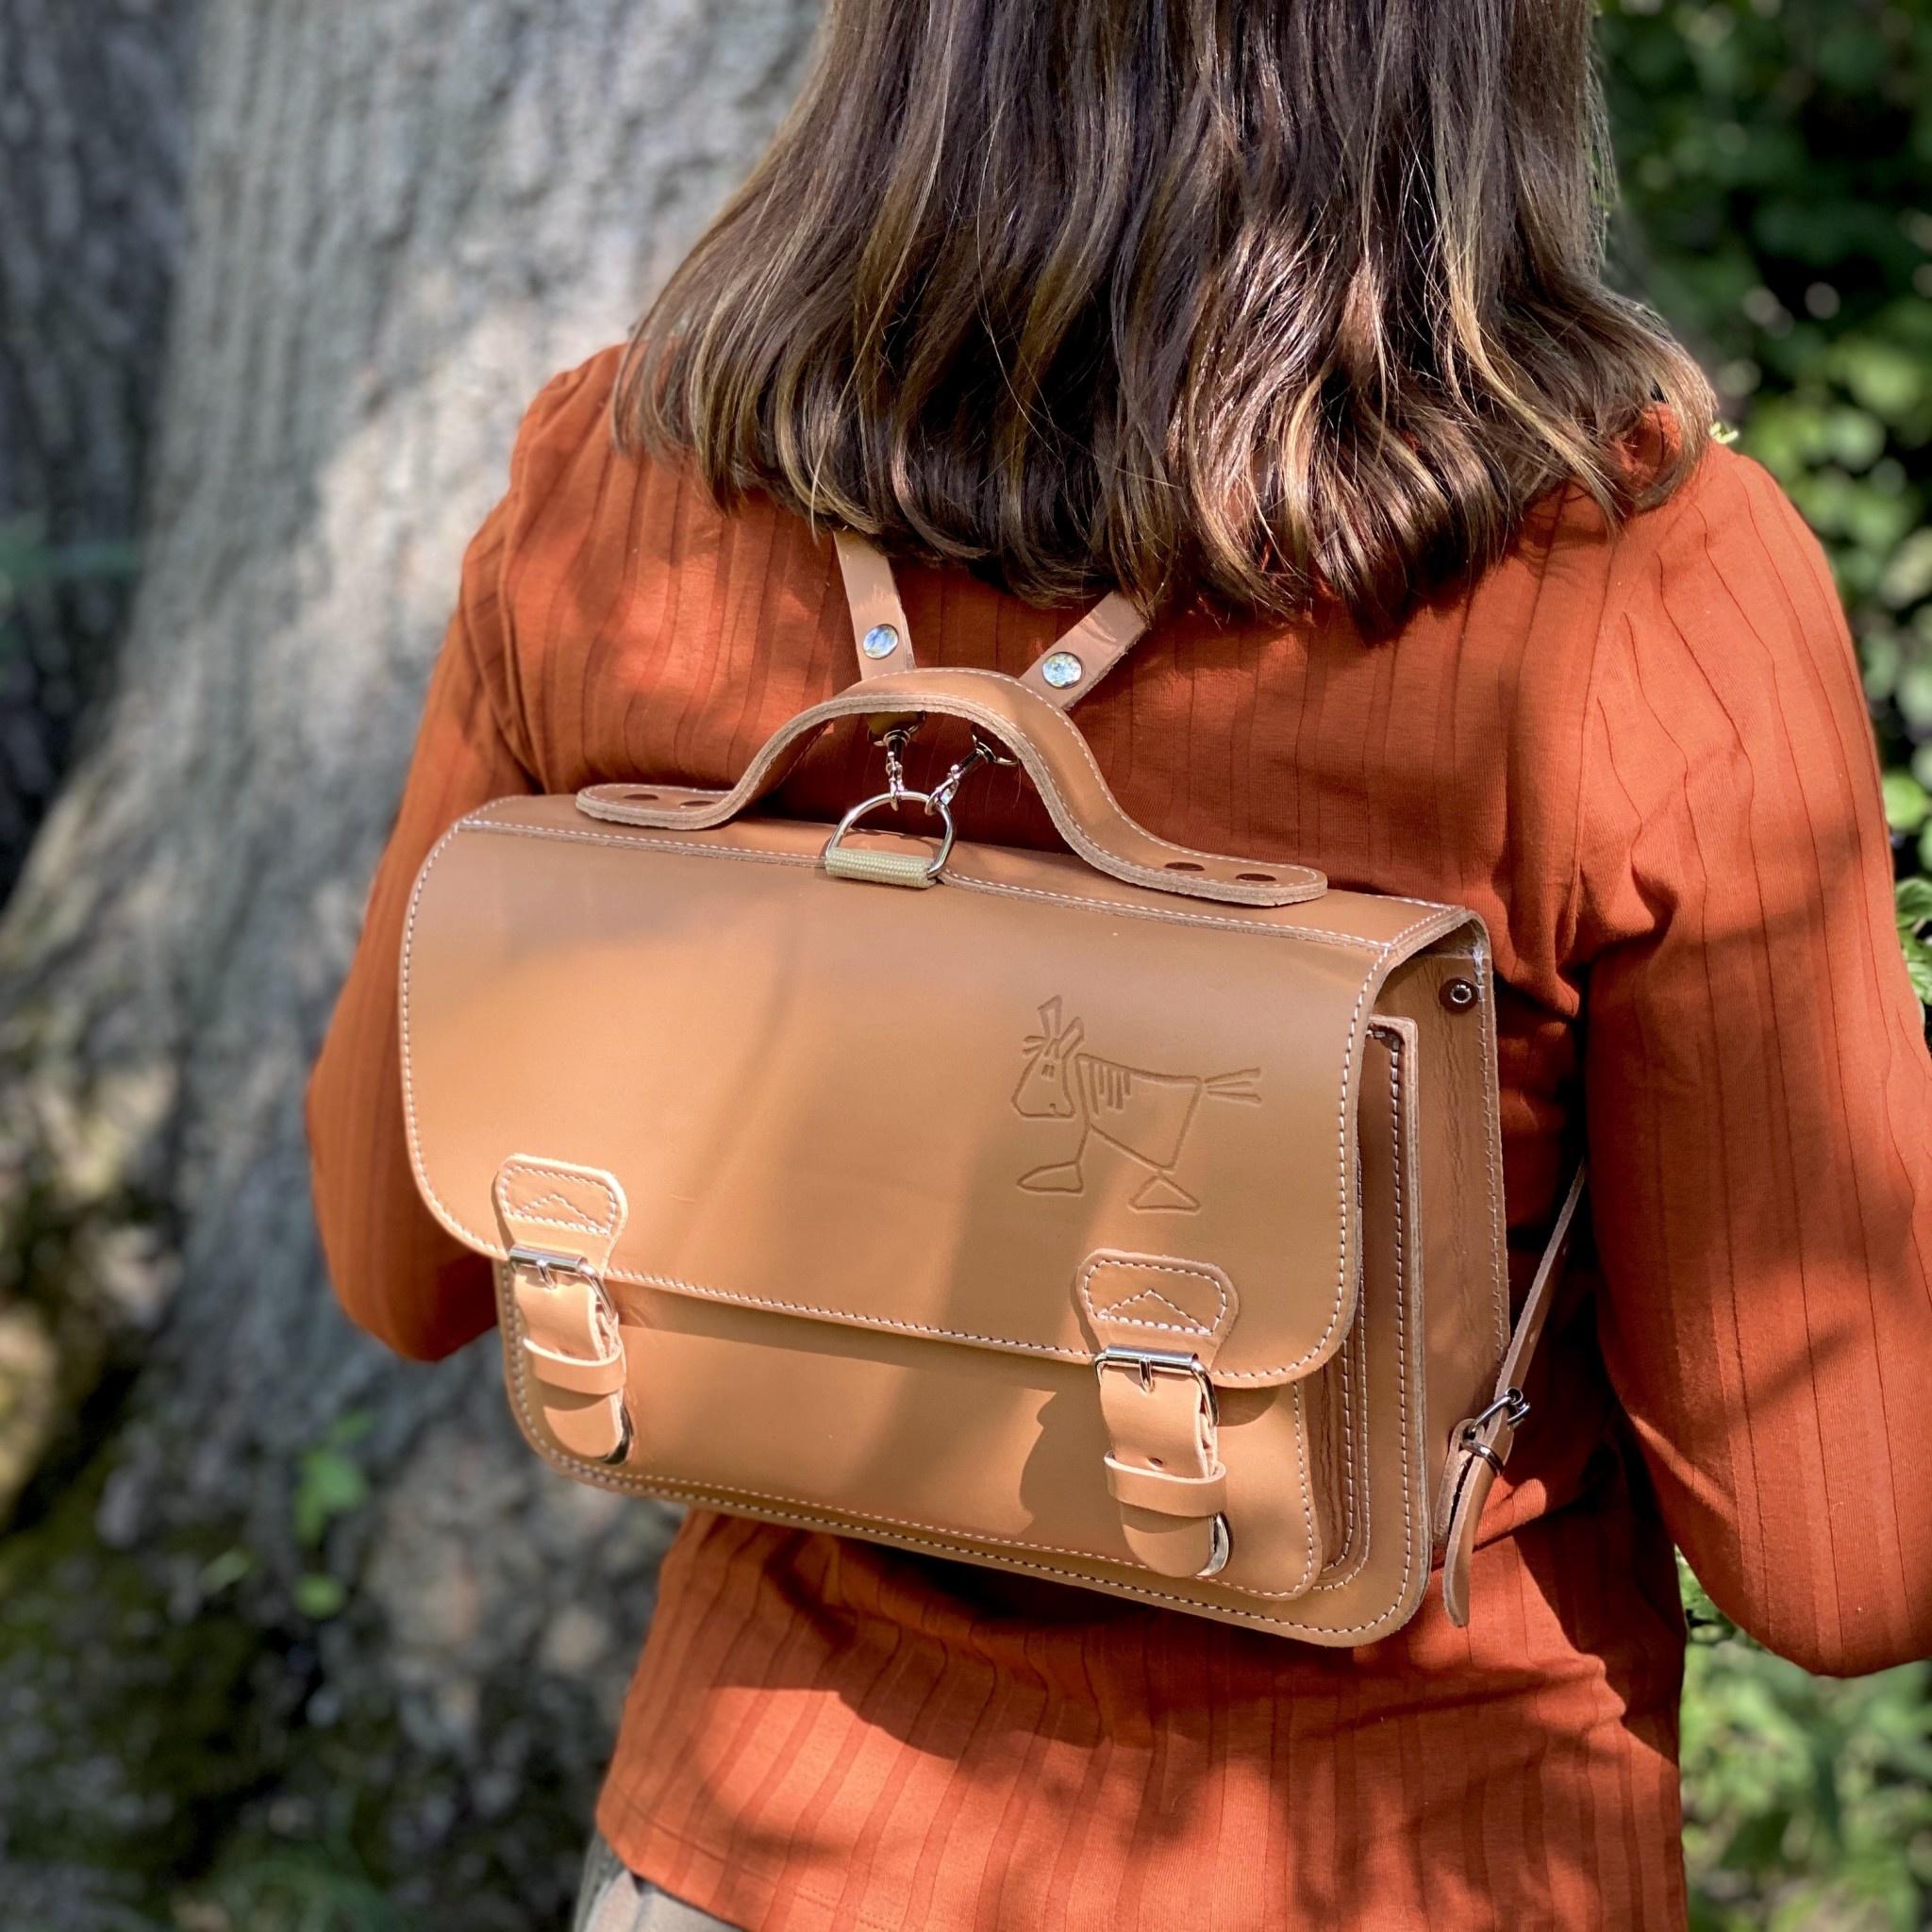 Ruitertassen Natural Leather Children's School Backpack with Front Pocket